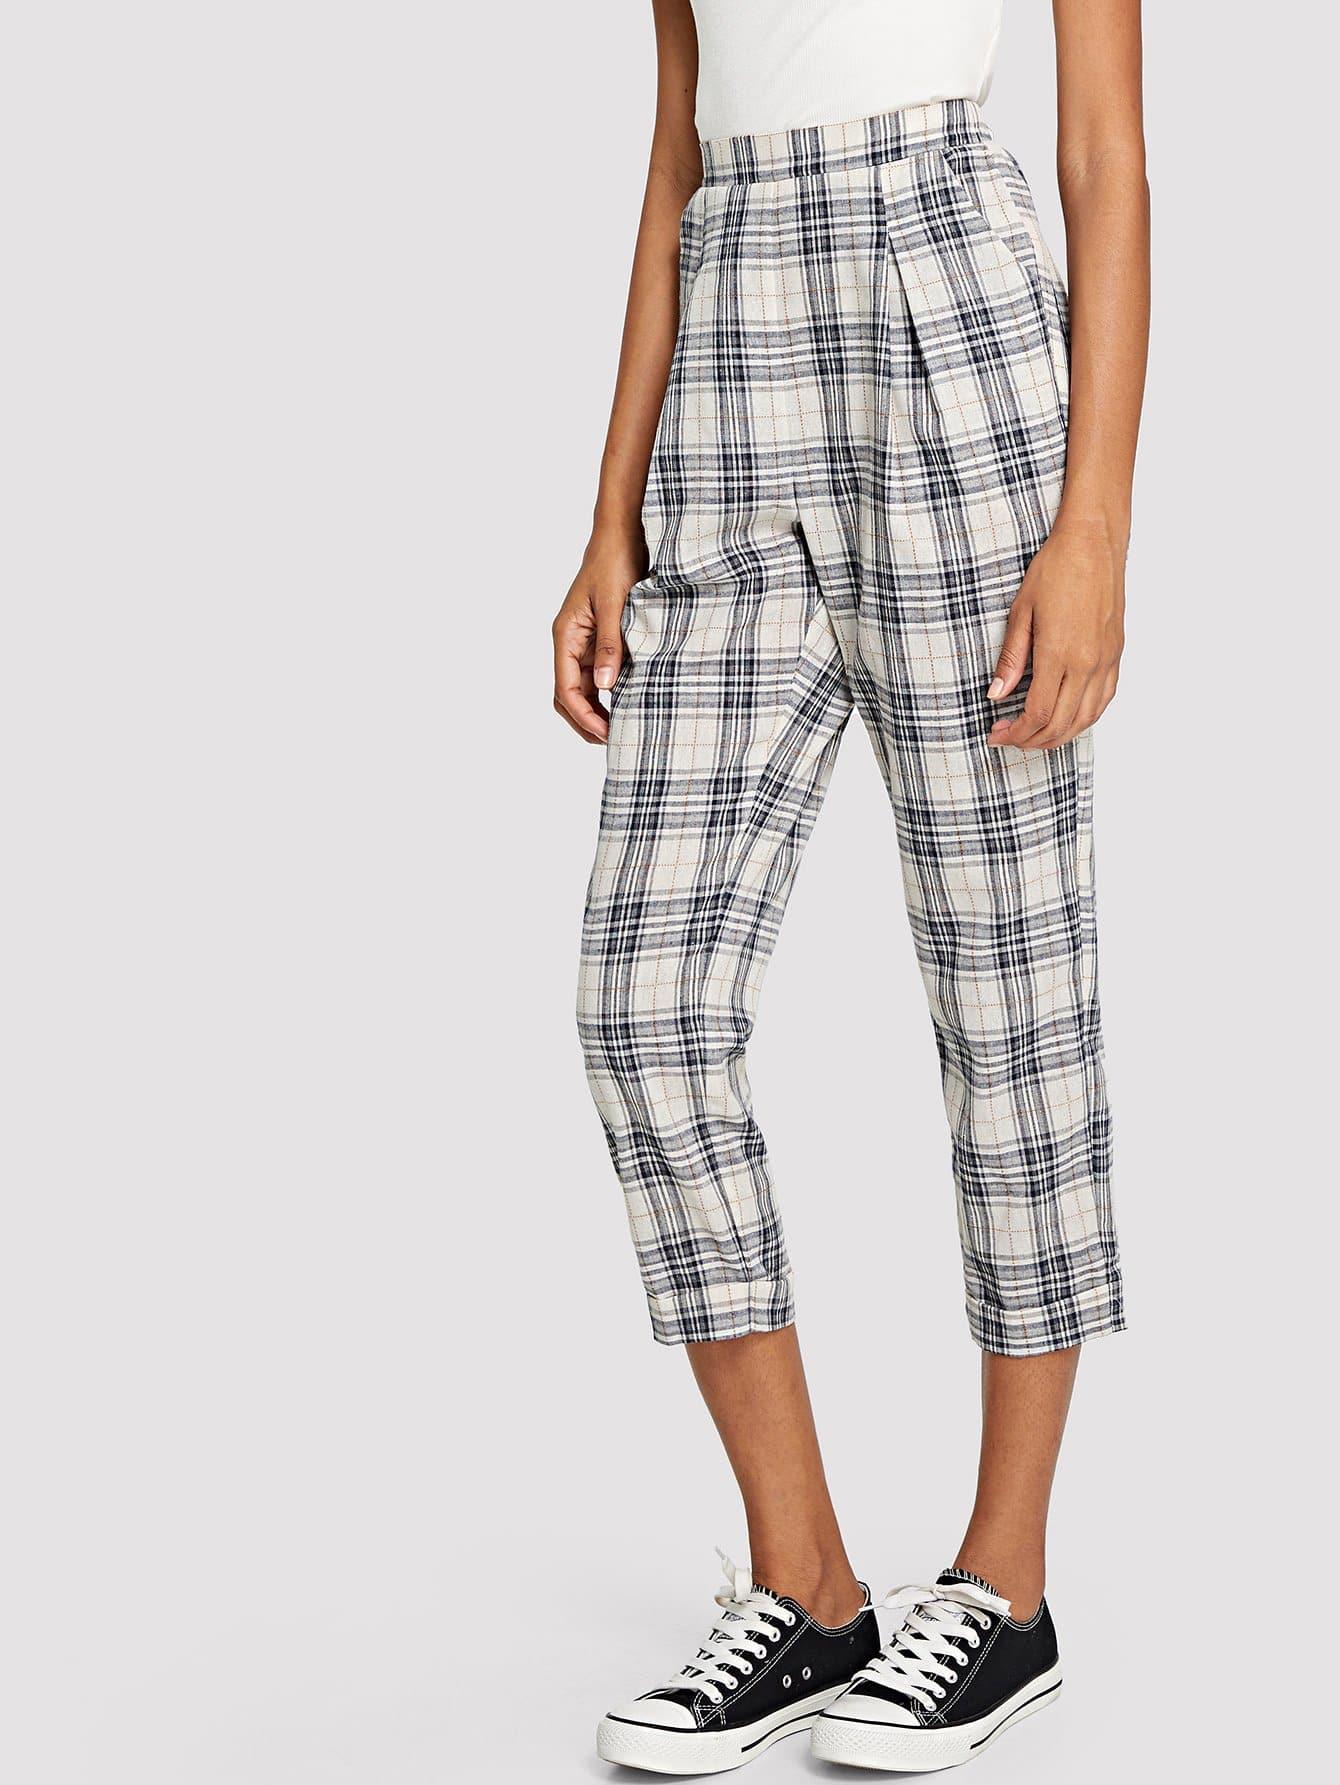 High Waist Grid Peg Leg Pants s xxl 2018 skinny slim high waist pencil pants women stretch sexy denim jeans bodycon leg split trousers